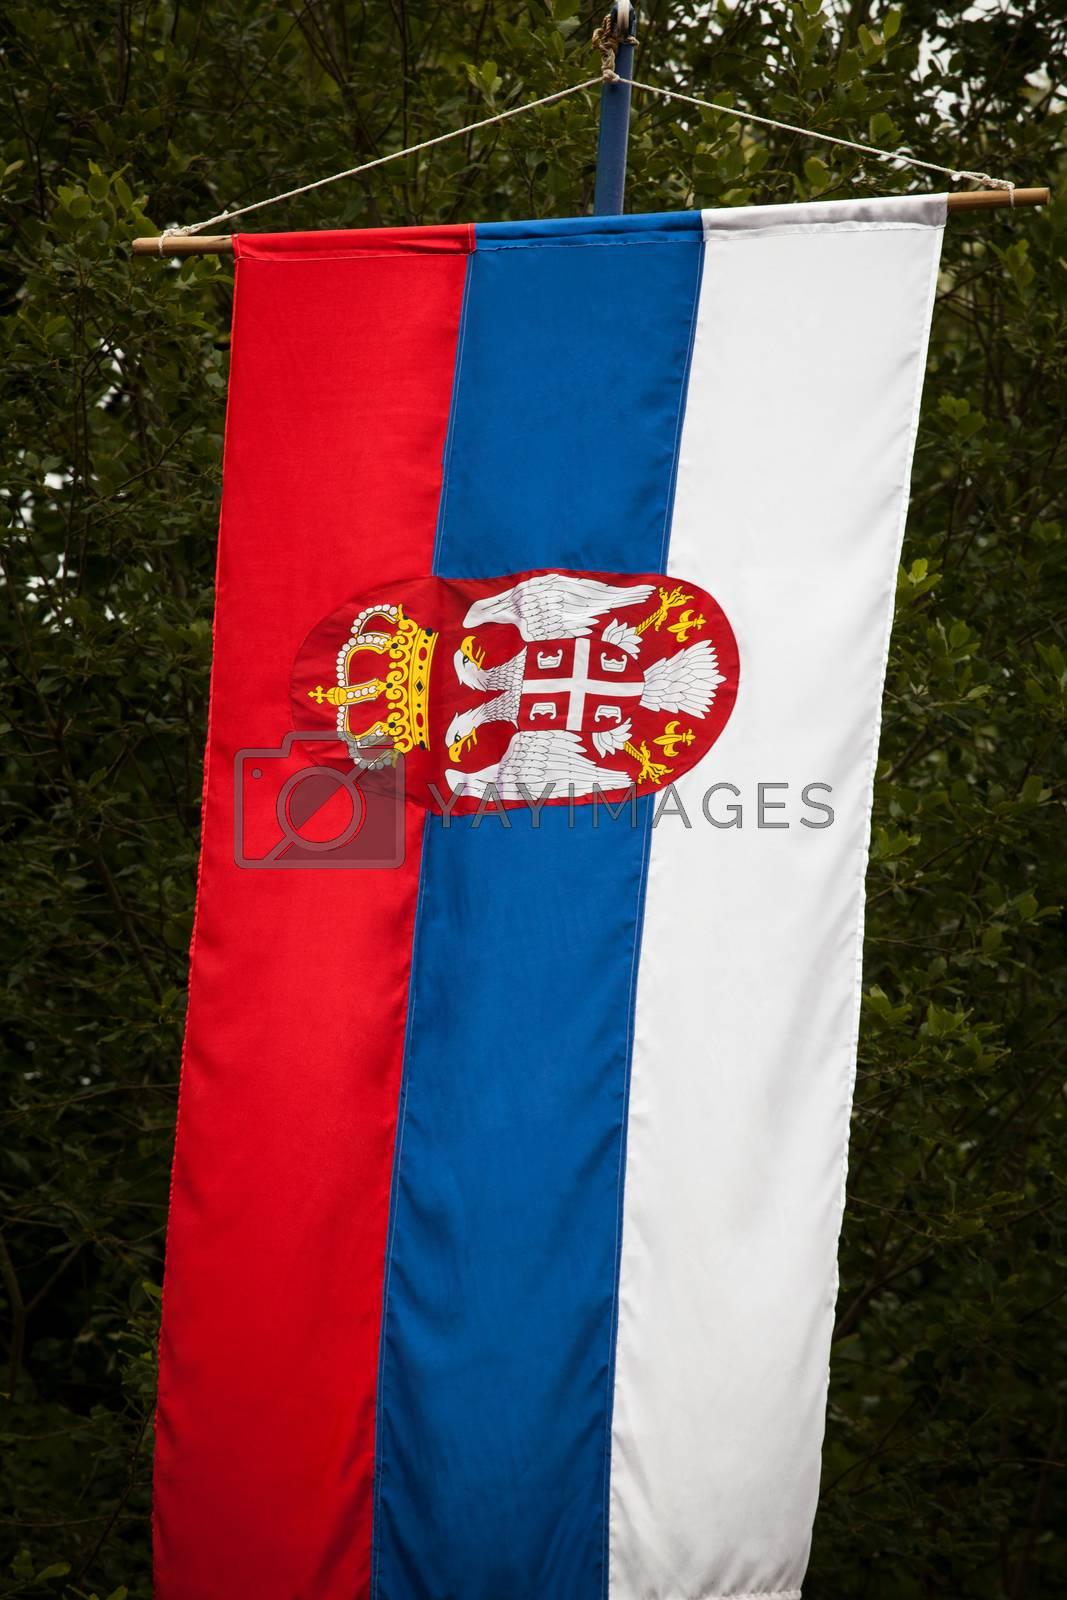 Royalty free image of Serbian national flag by IxMaster